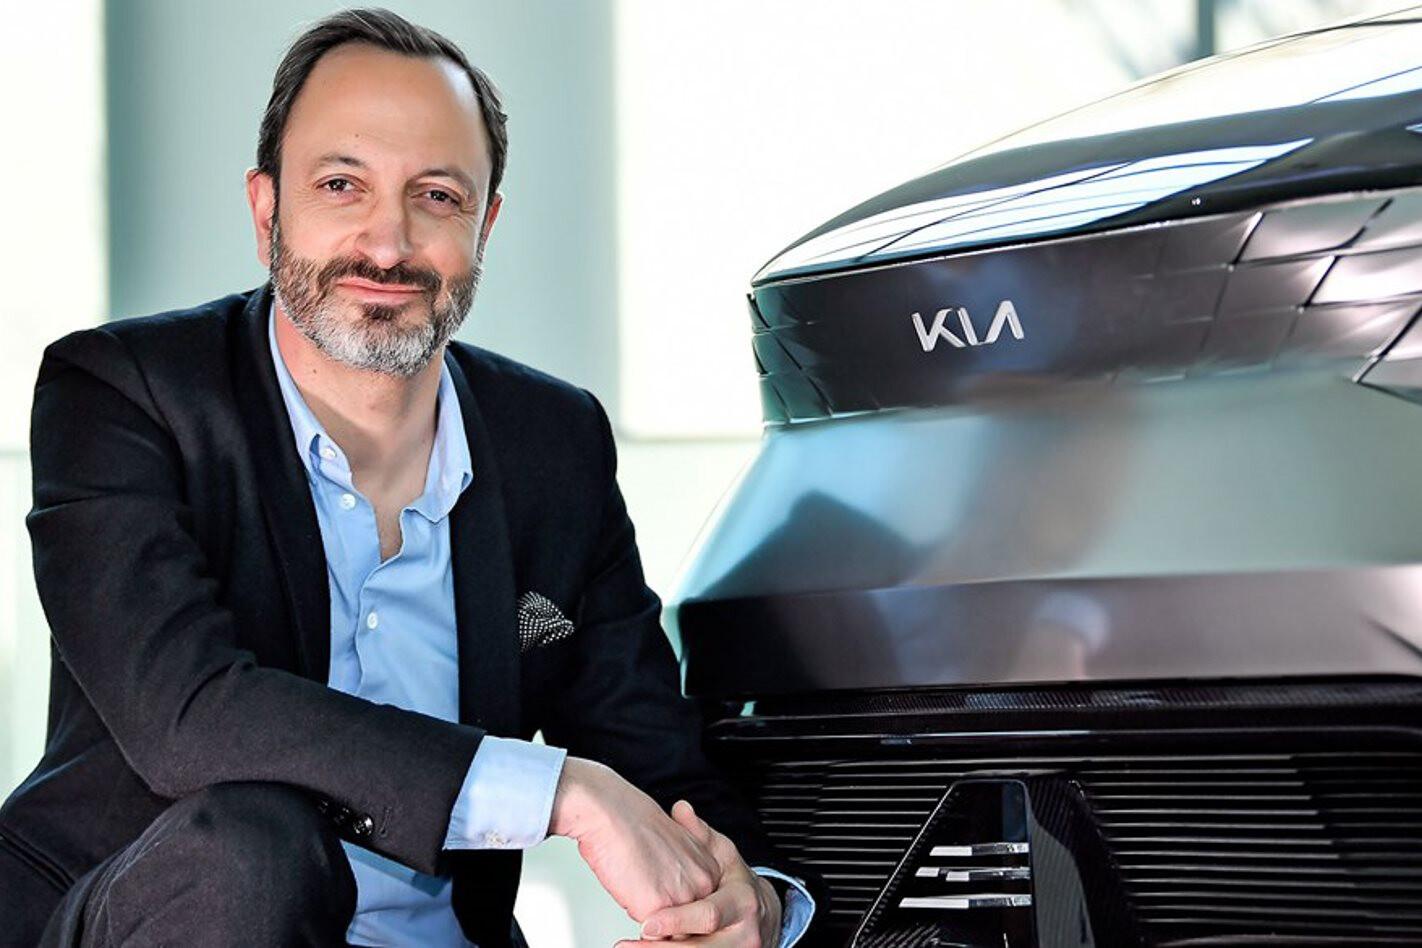 Karim Habib Kia Design Jpg